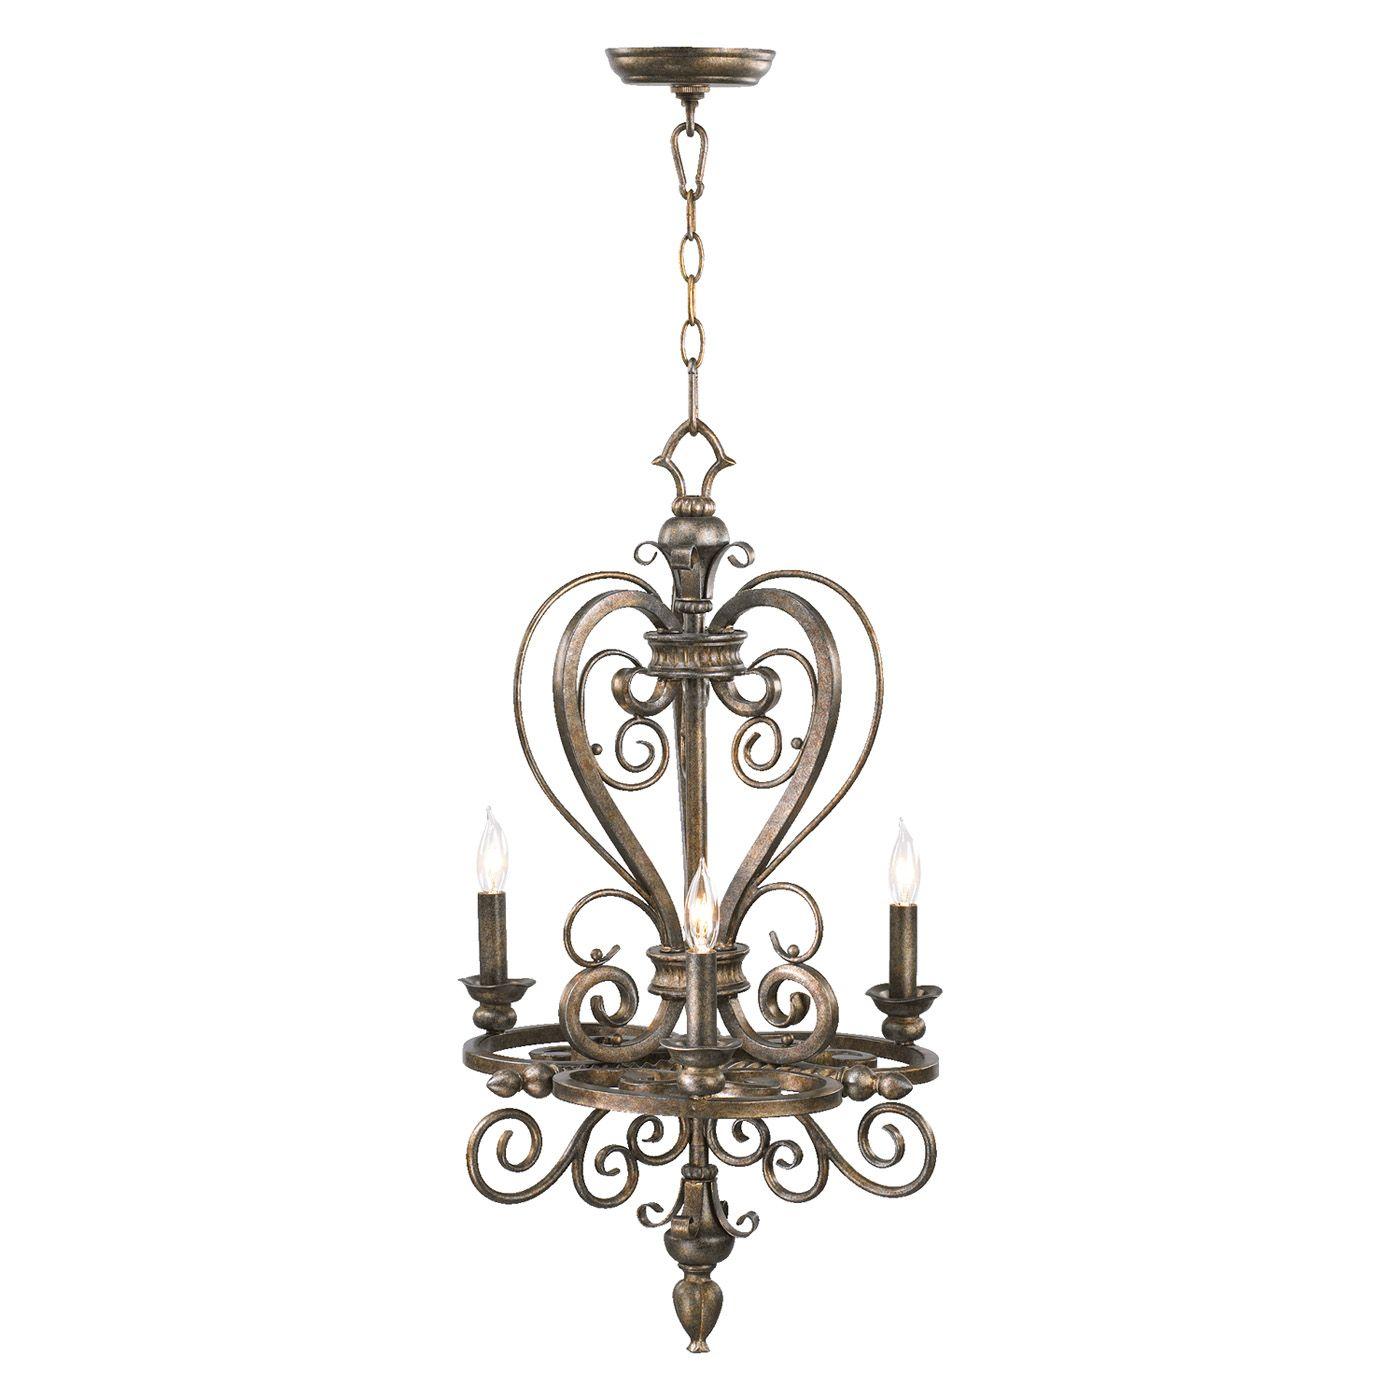 Quorum international light virage mini chandelier